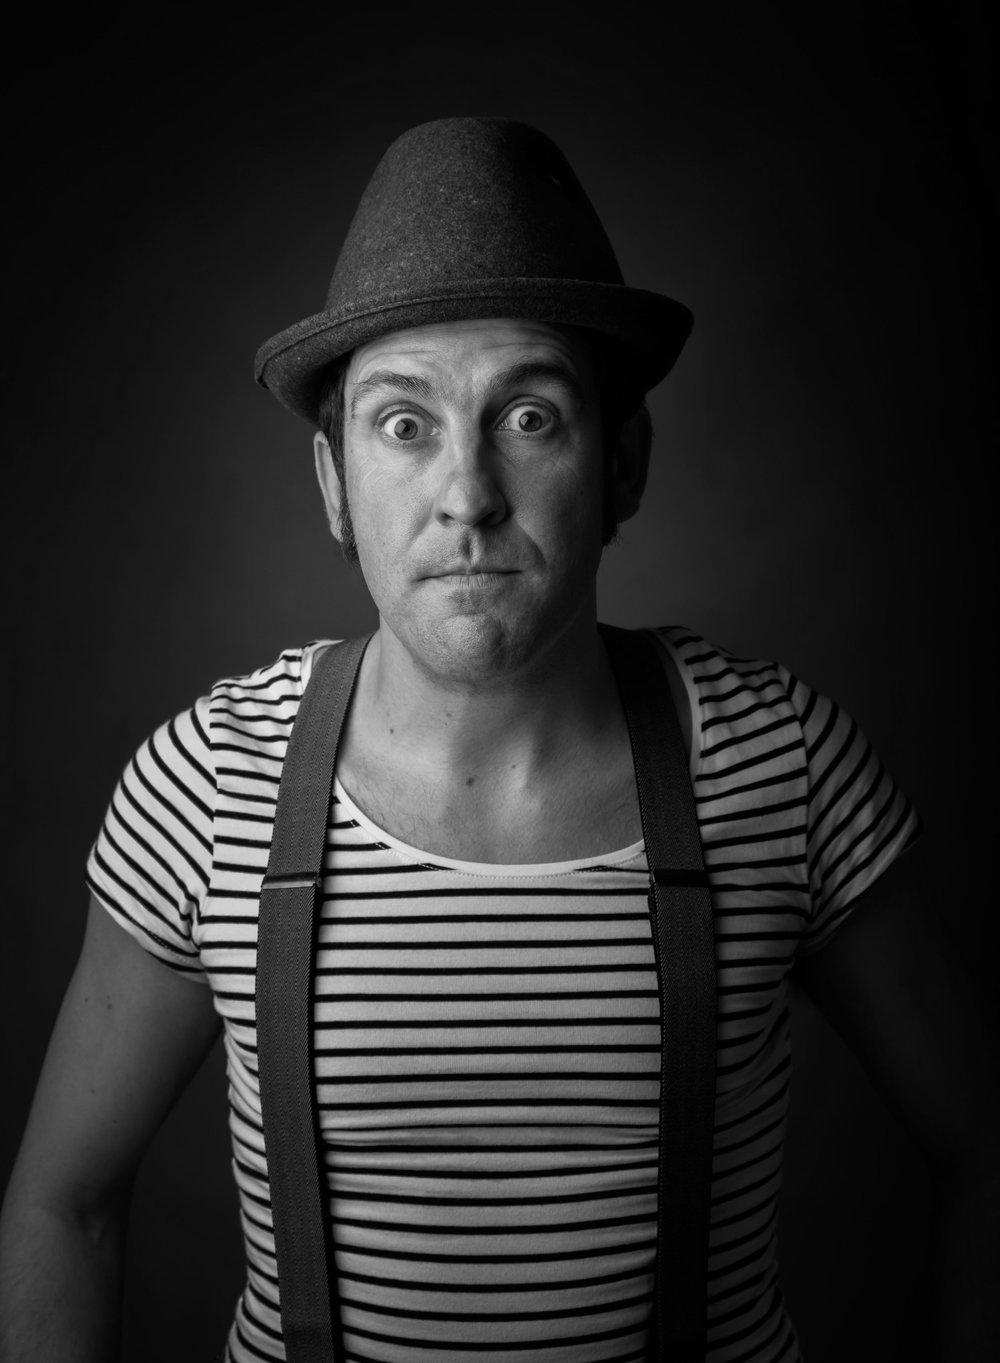 MIQUEL BARCELO (IRE)  Actor, director, musician and theatre activist  [MORE]